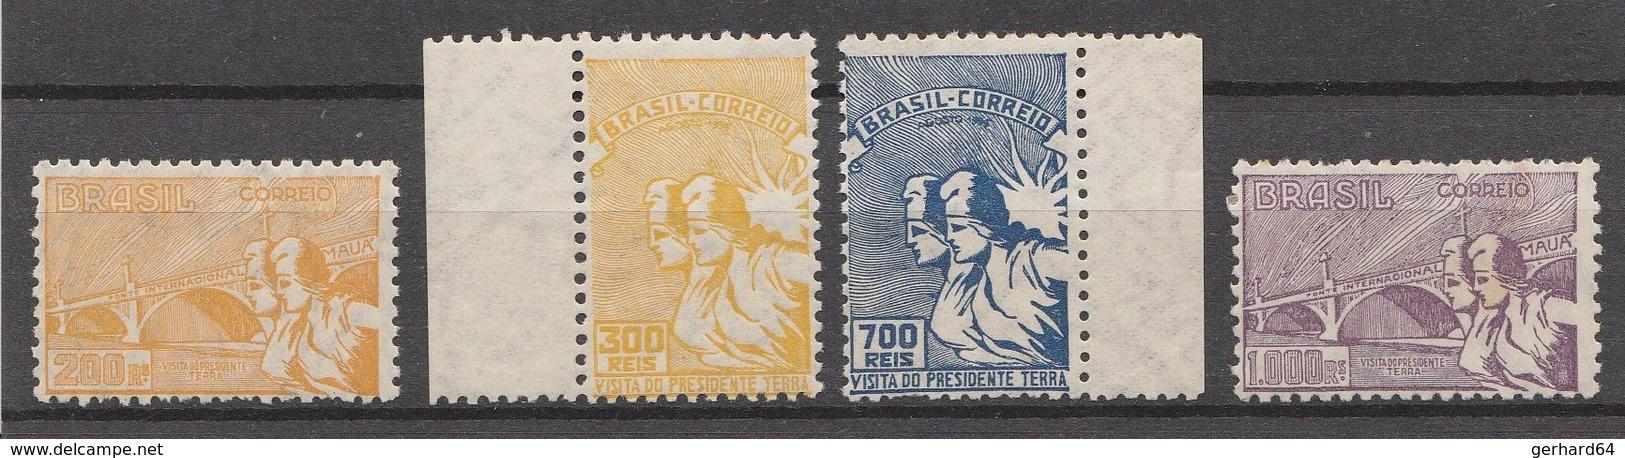 BRESIL 1935 - Yvert N° 279 à 282 - Série Complète ** Et * - 4 Valeurs (Visita Do Presidente Terra) - Brazil